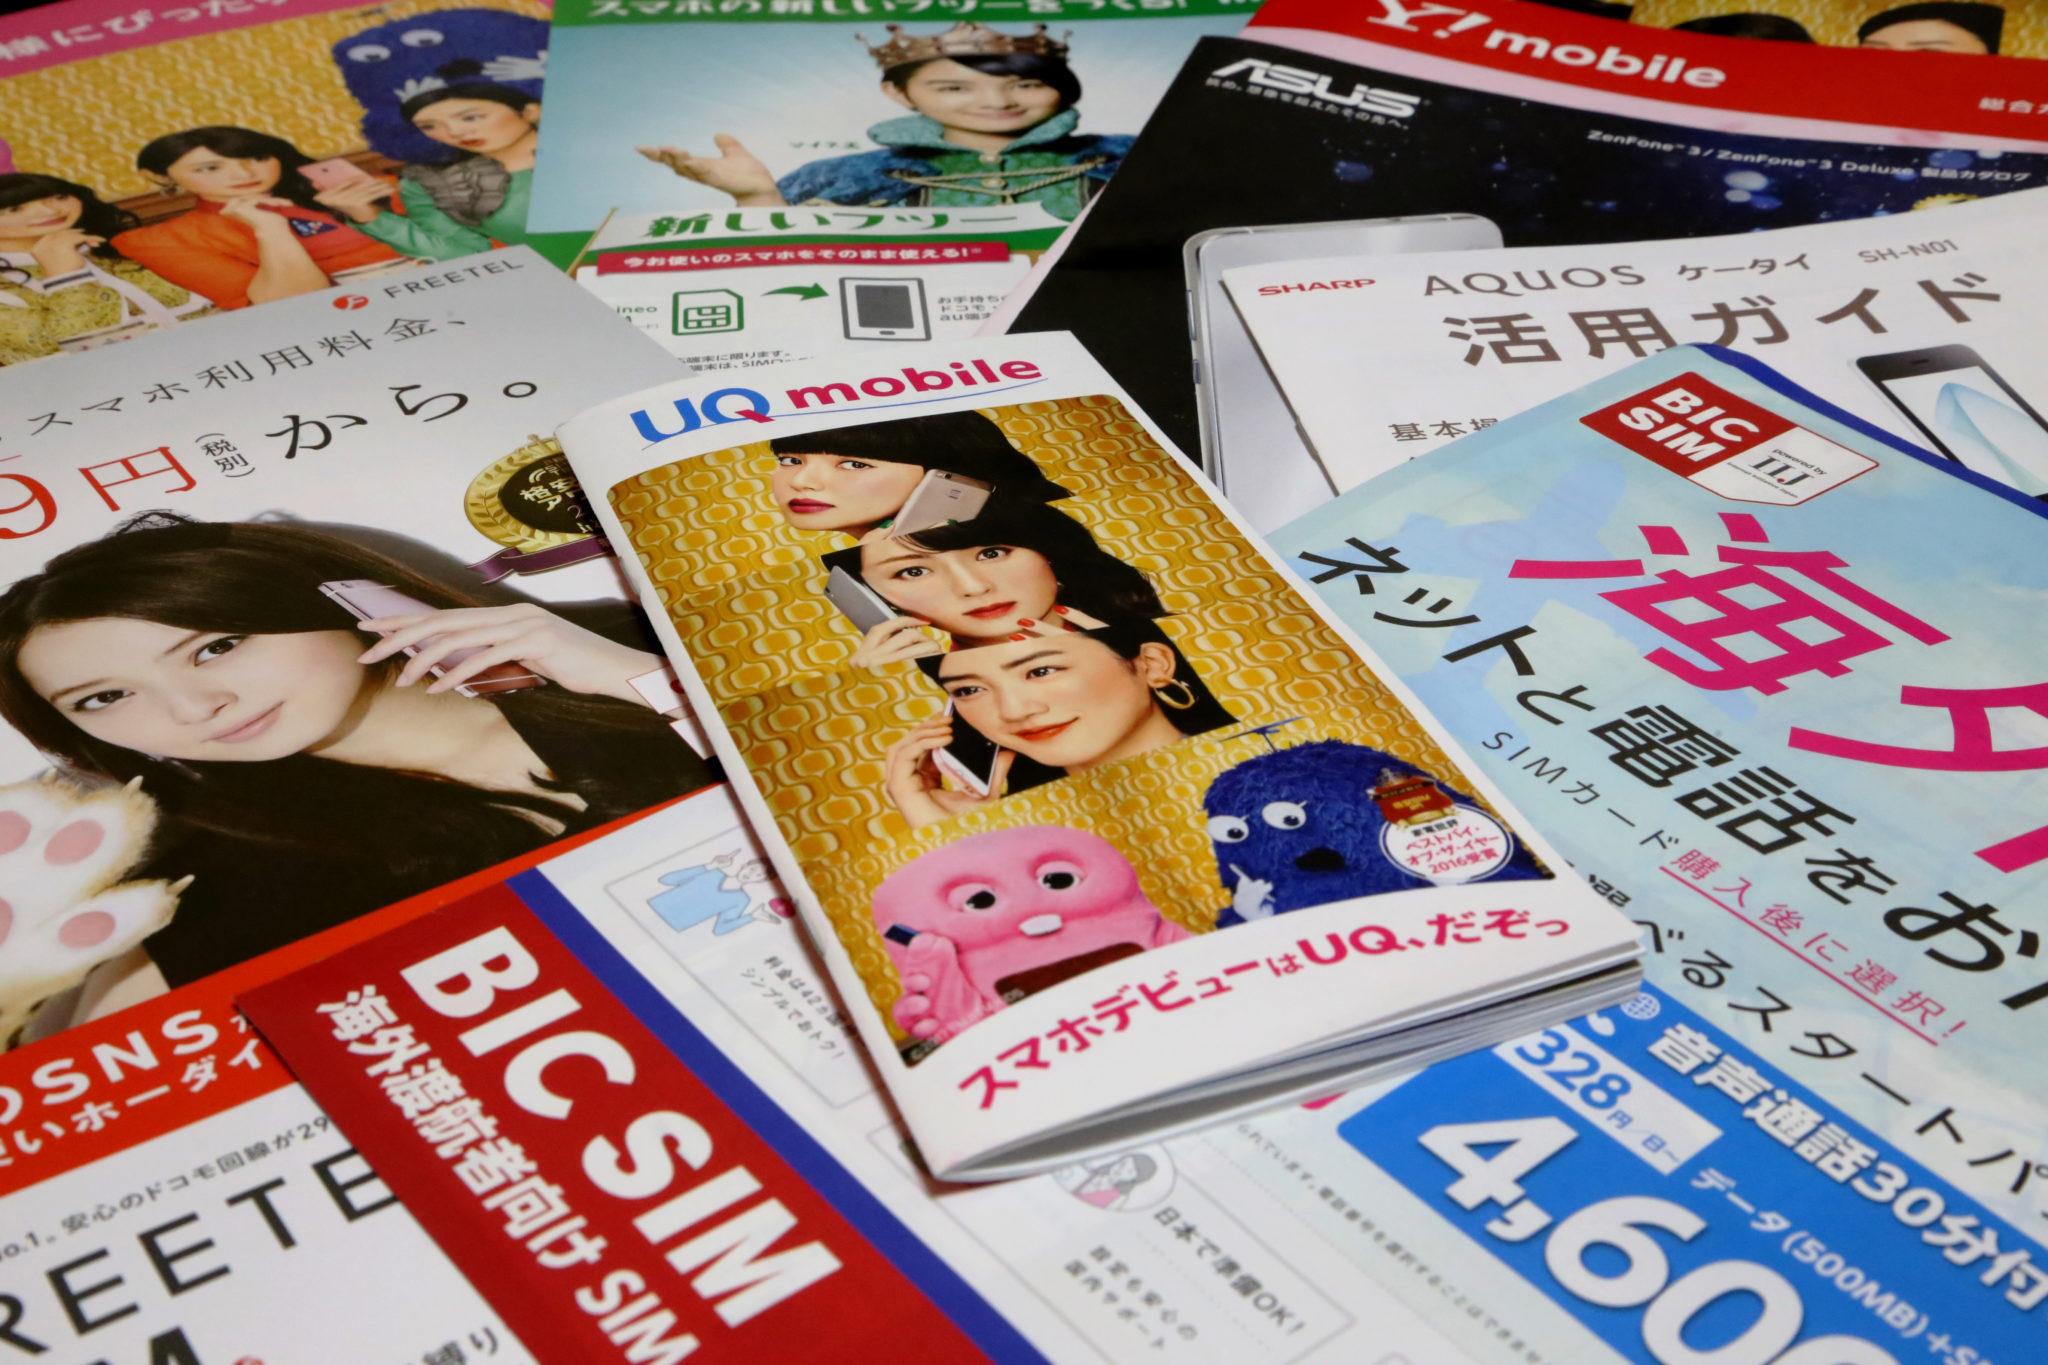 Japanese phone services